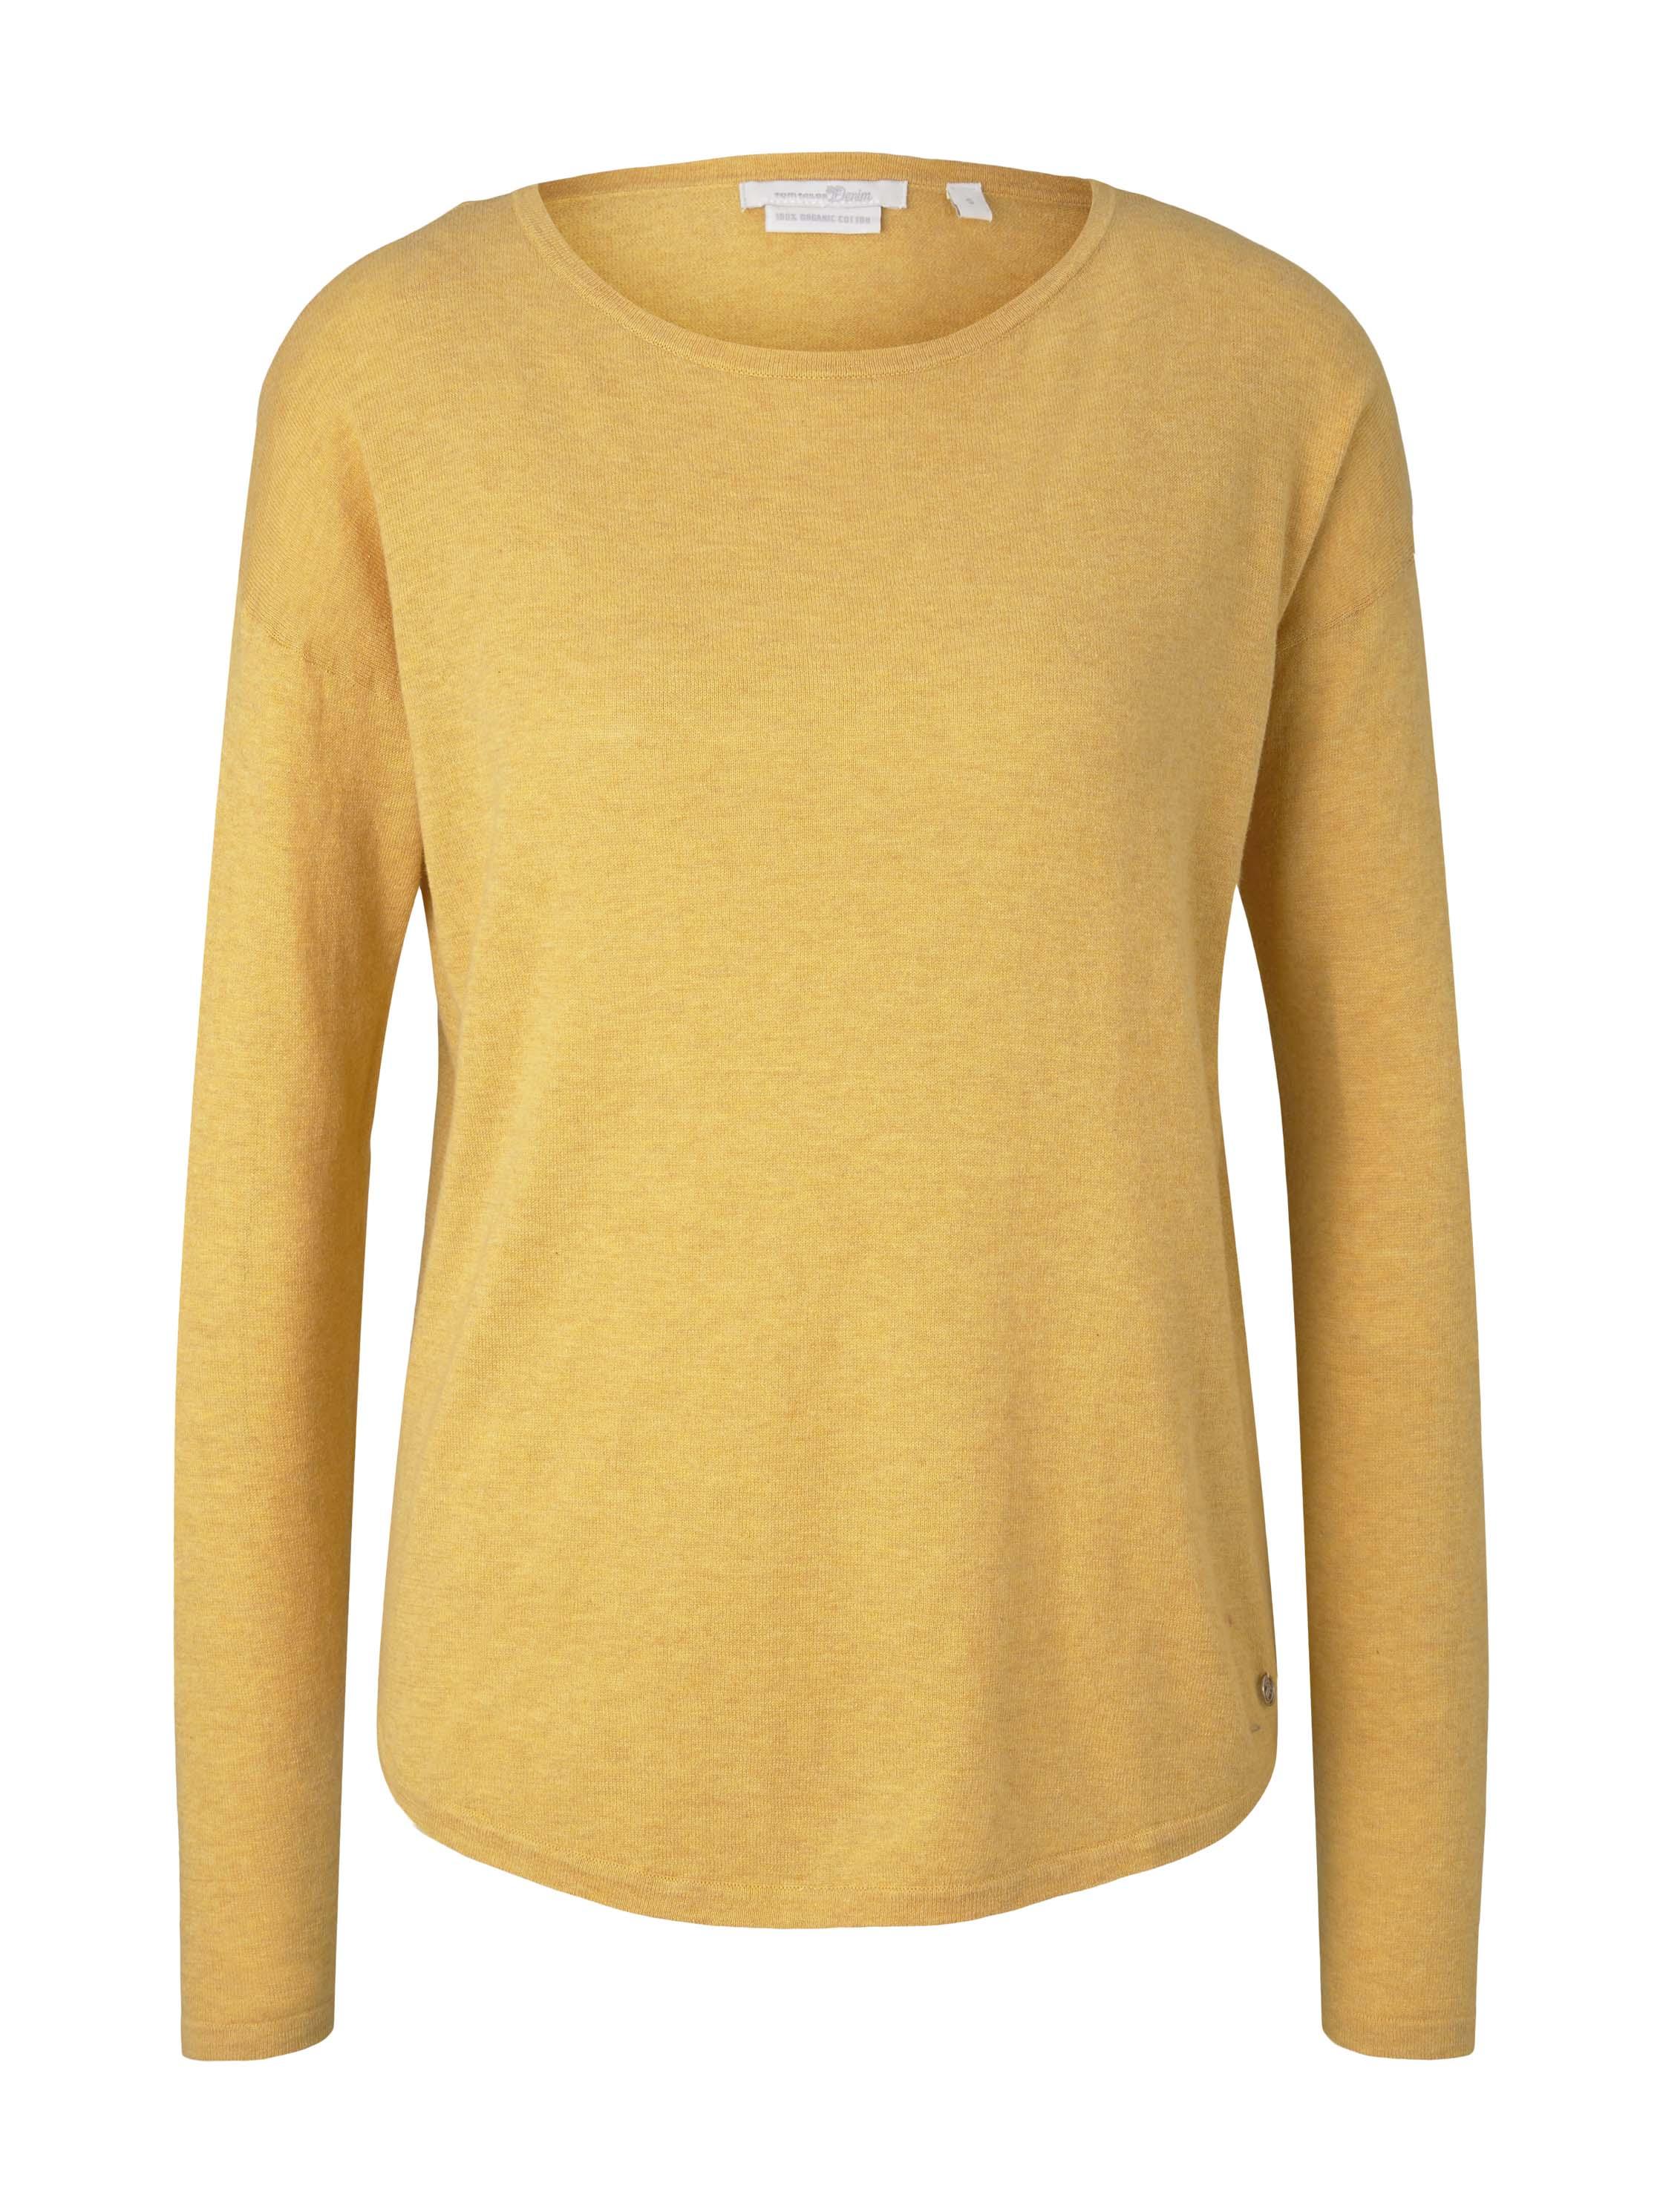 basic boat neck pullover, indian spice yellow melange